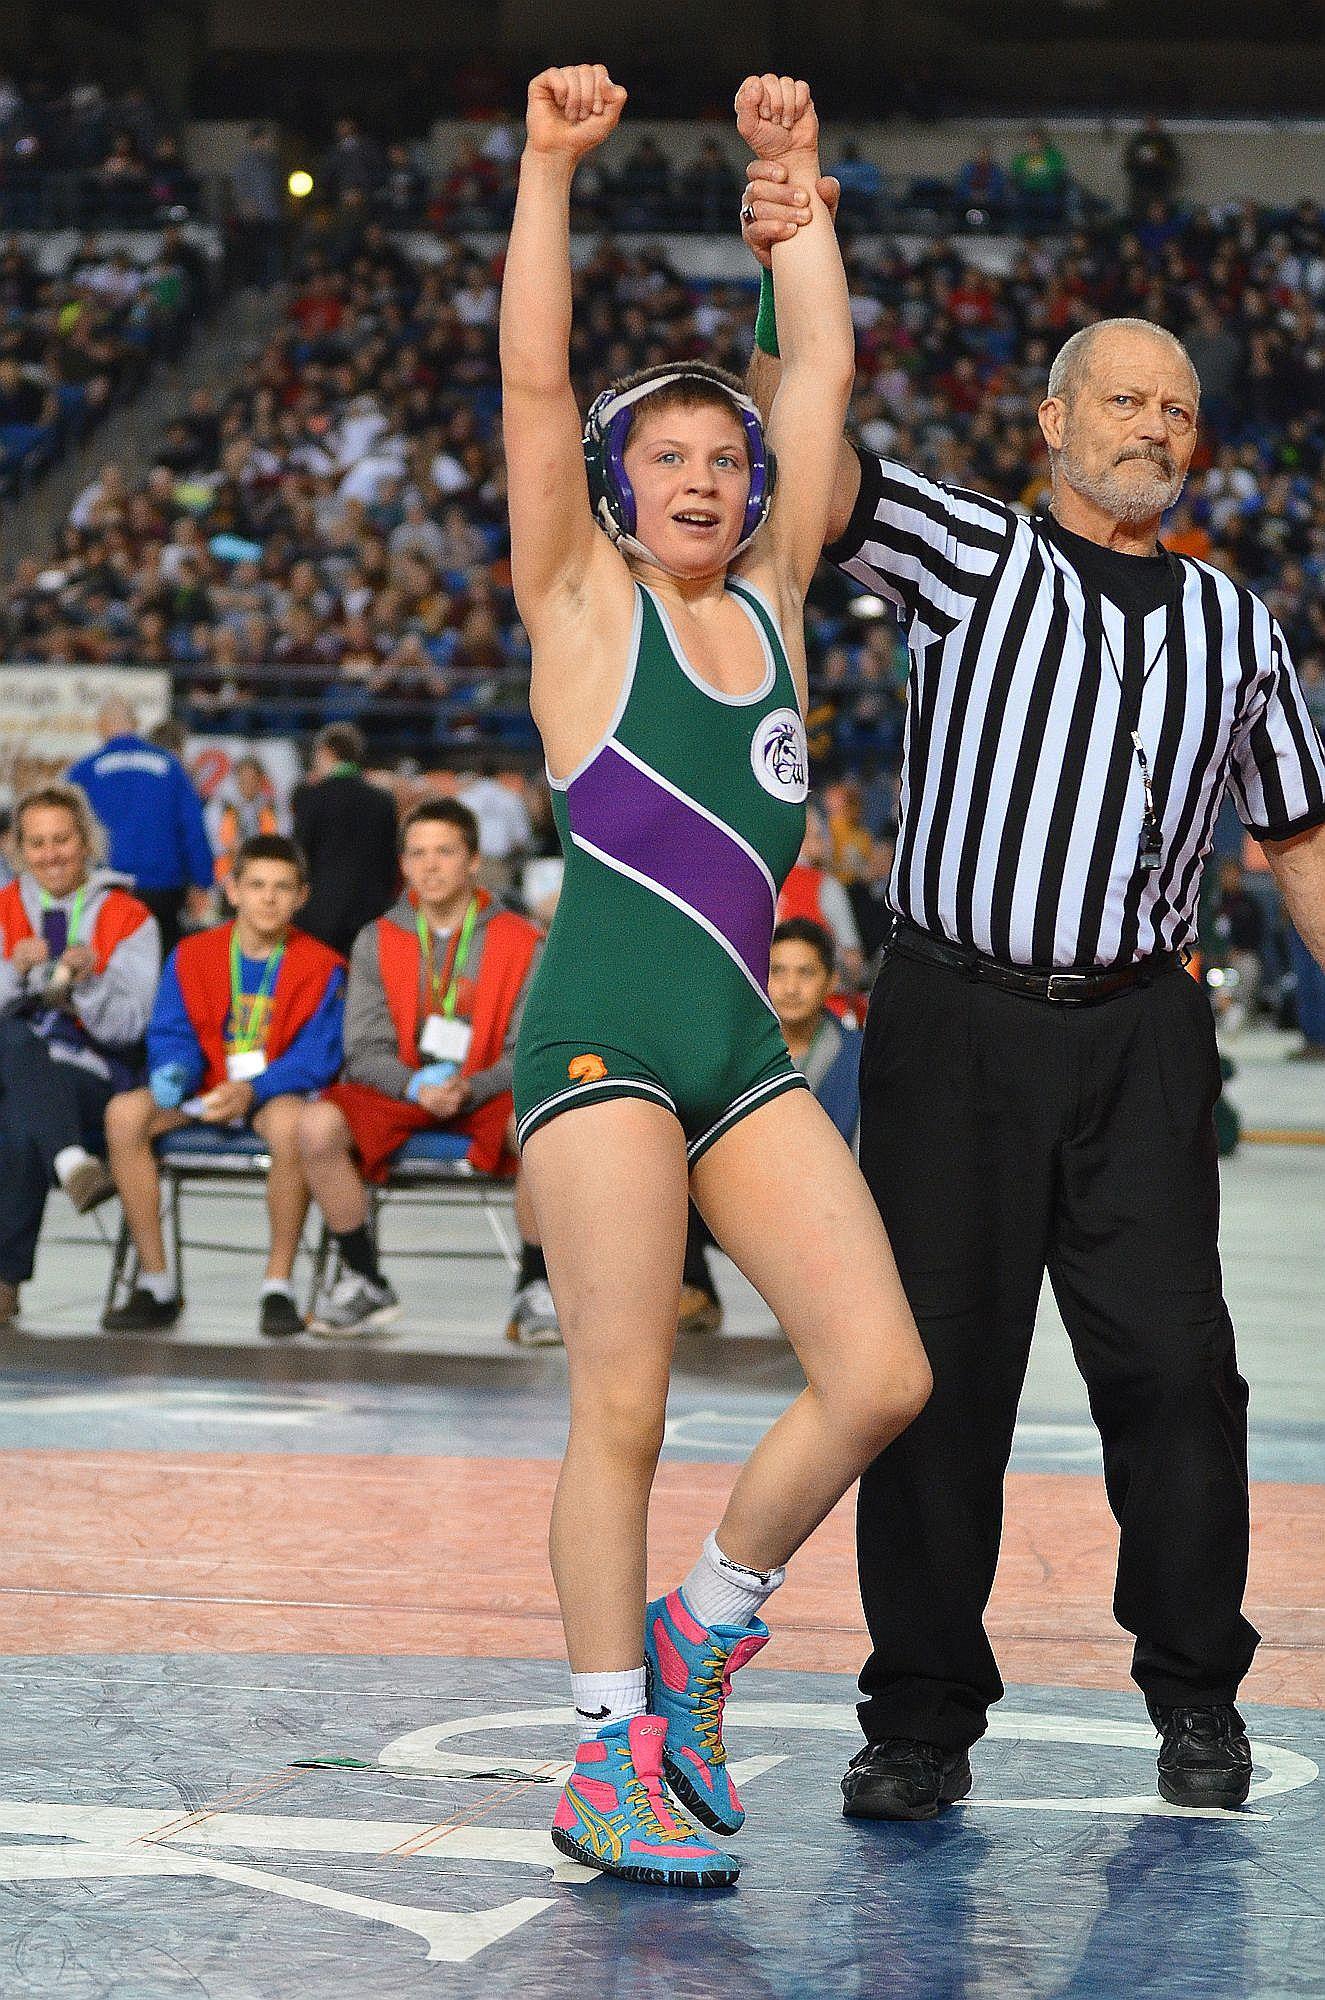 Noah Cuzzetto Wins State Wrestling Title